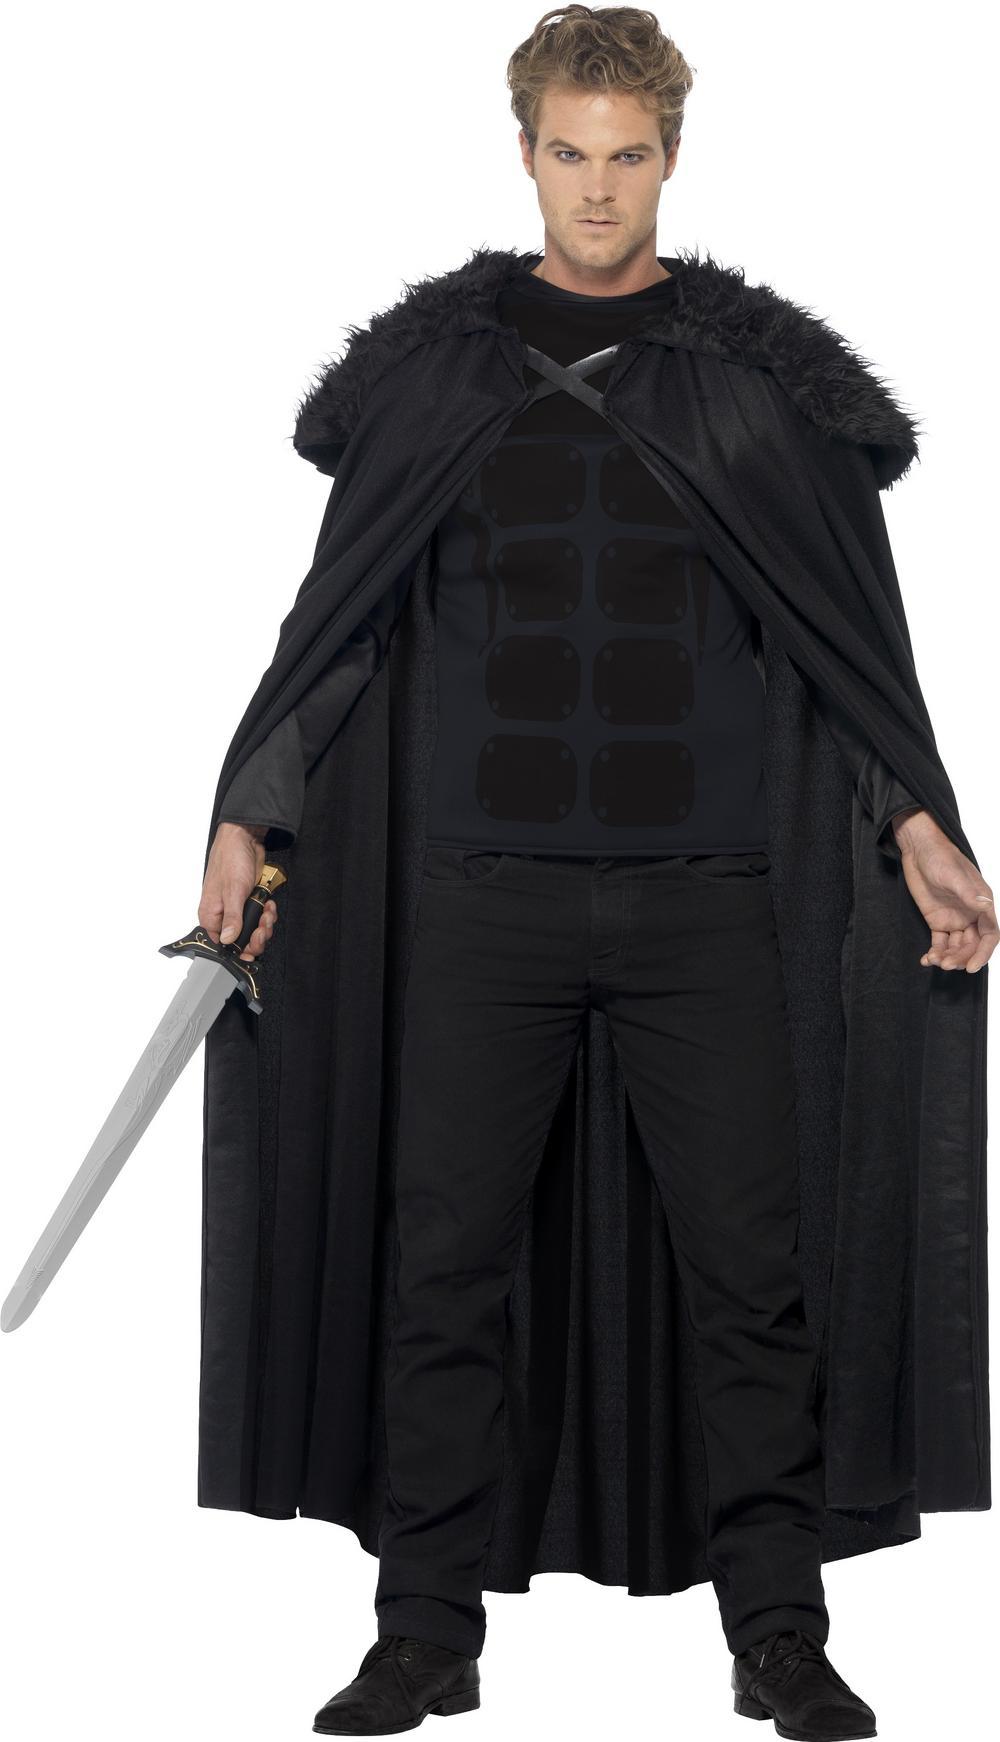 Dark Barbarian Costume